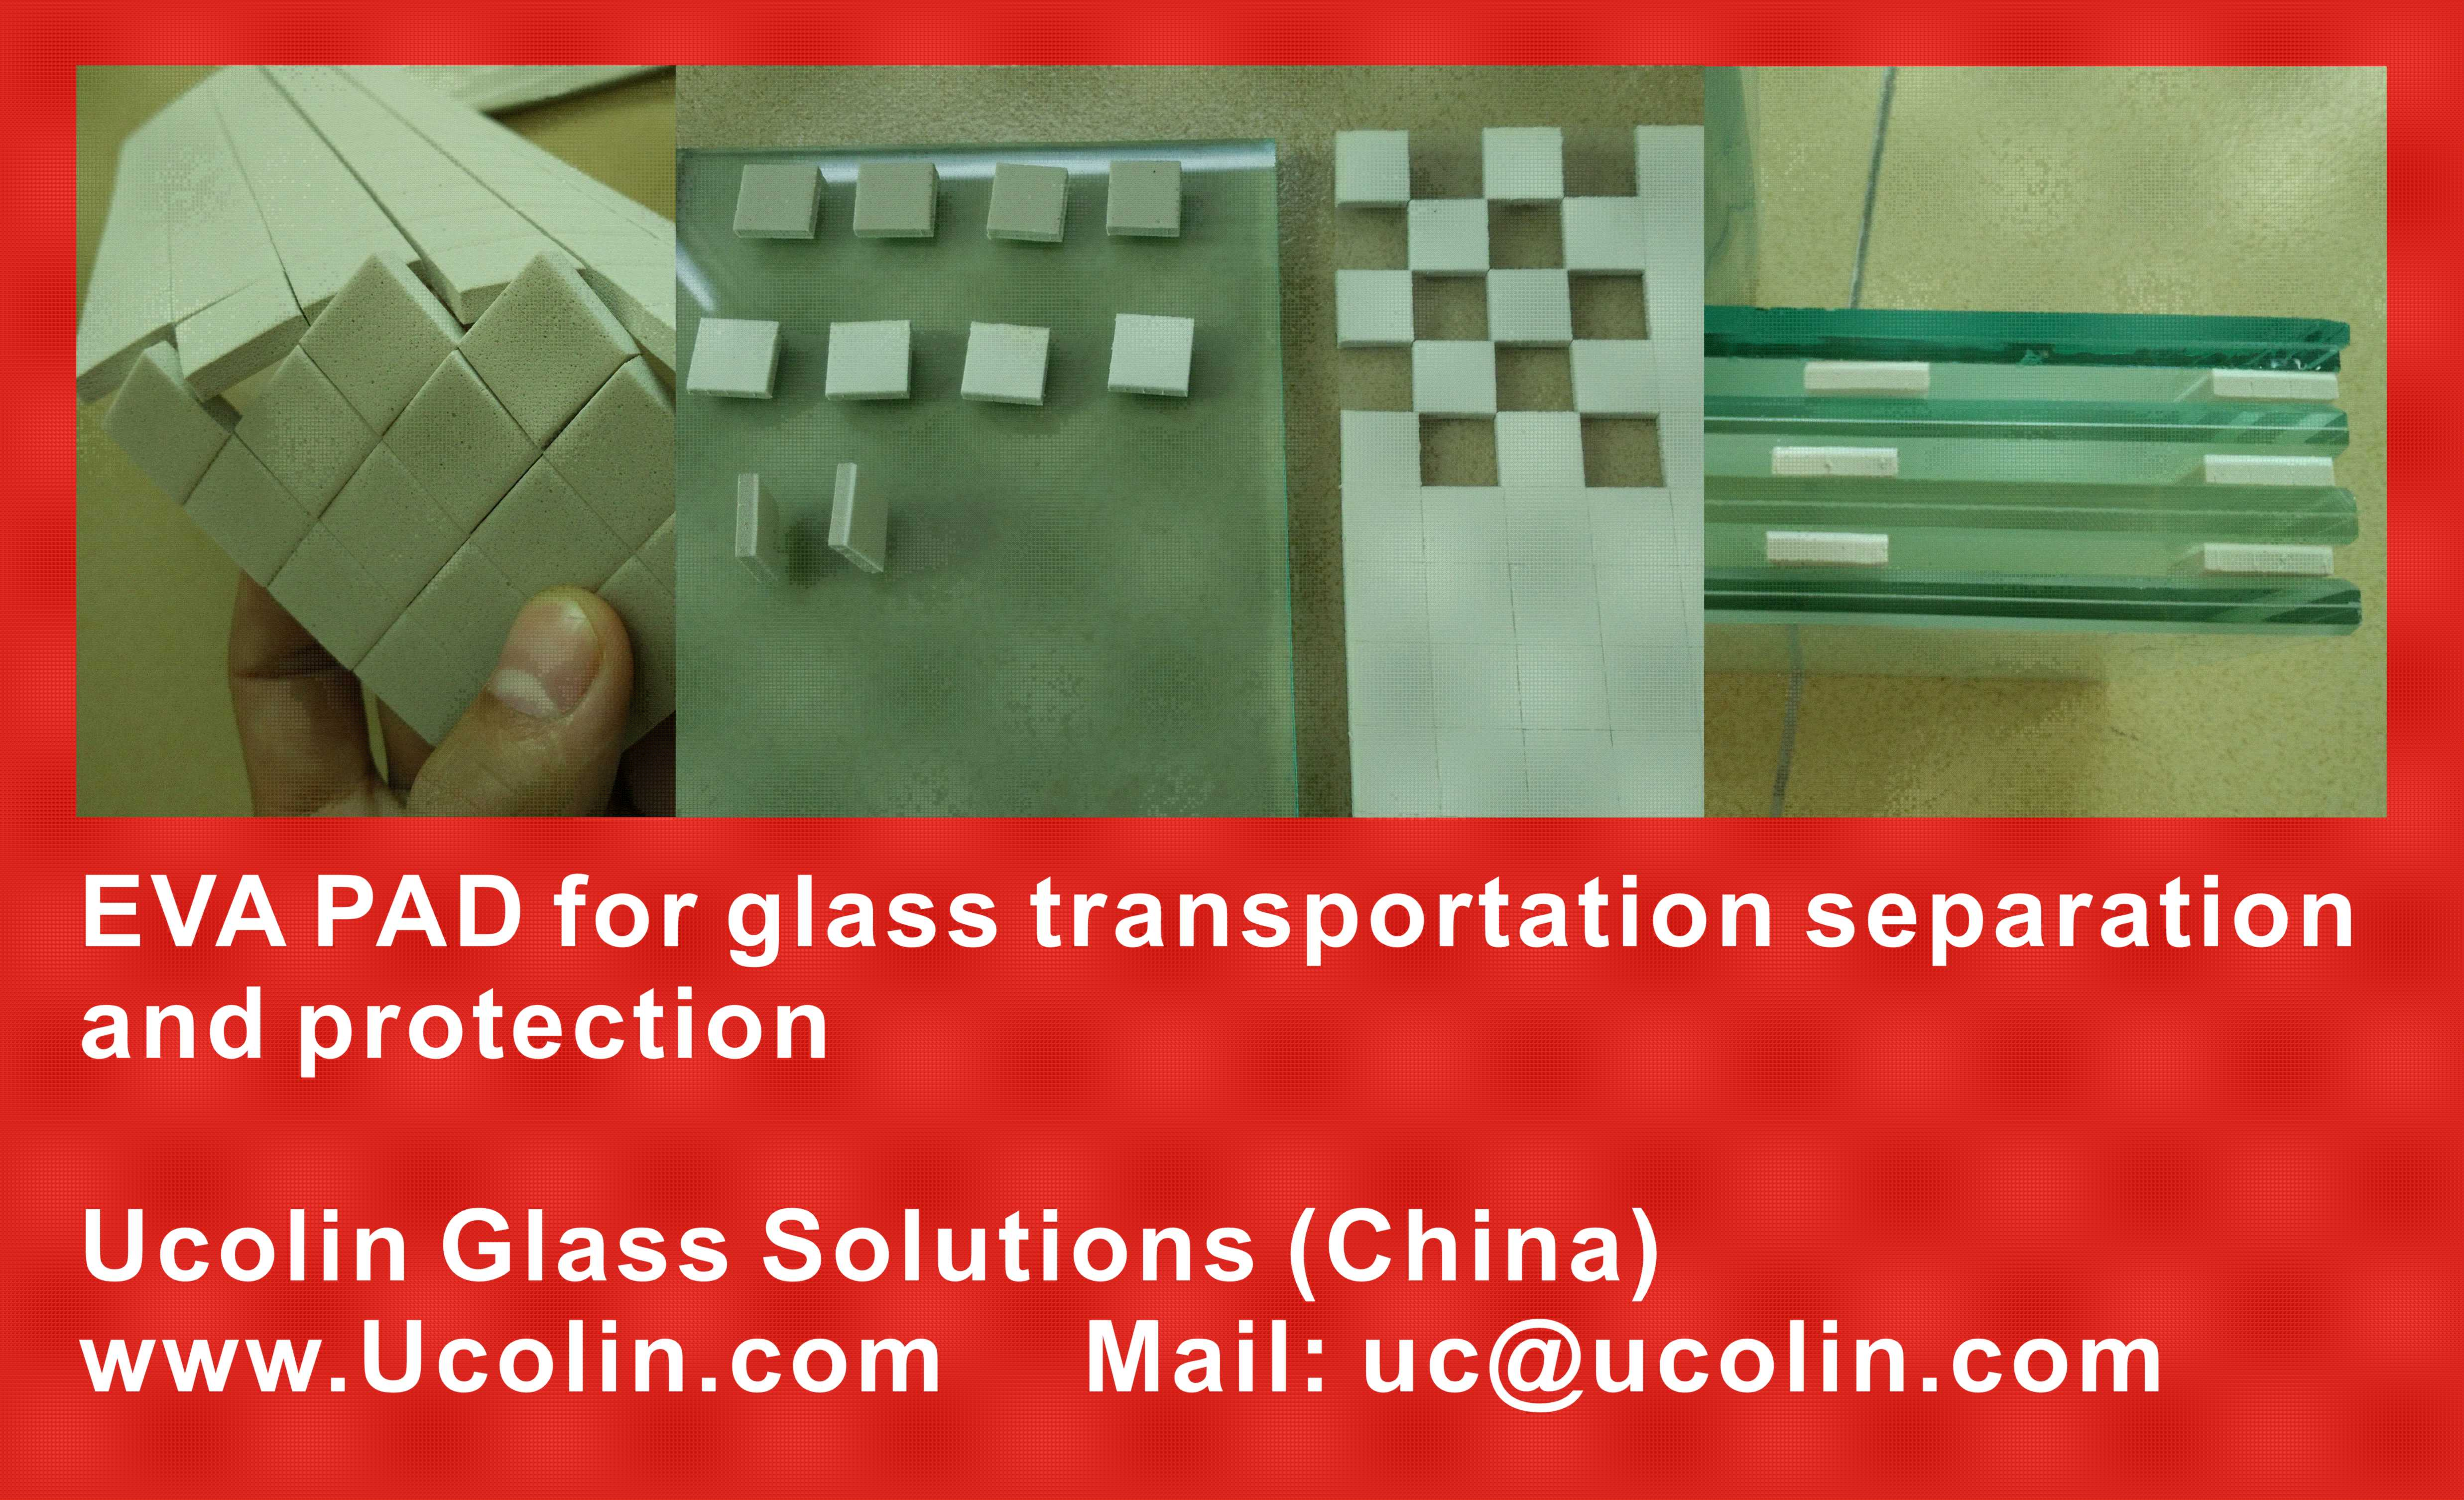 EVA PAD for glass transportation separation protection (1)